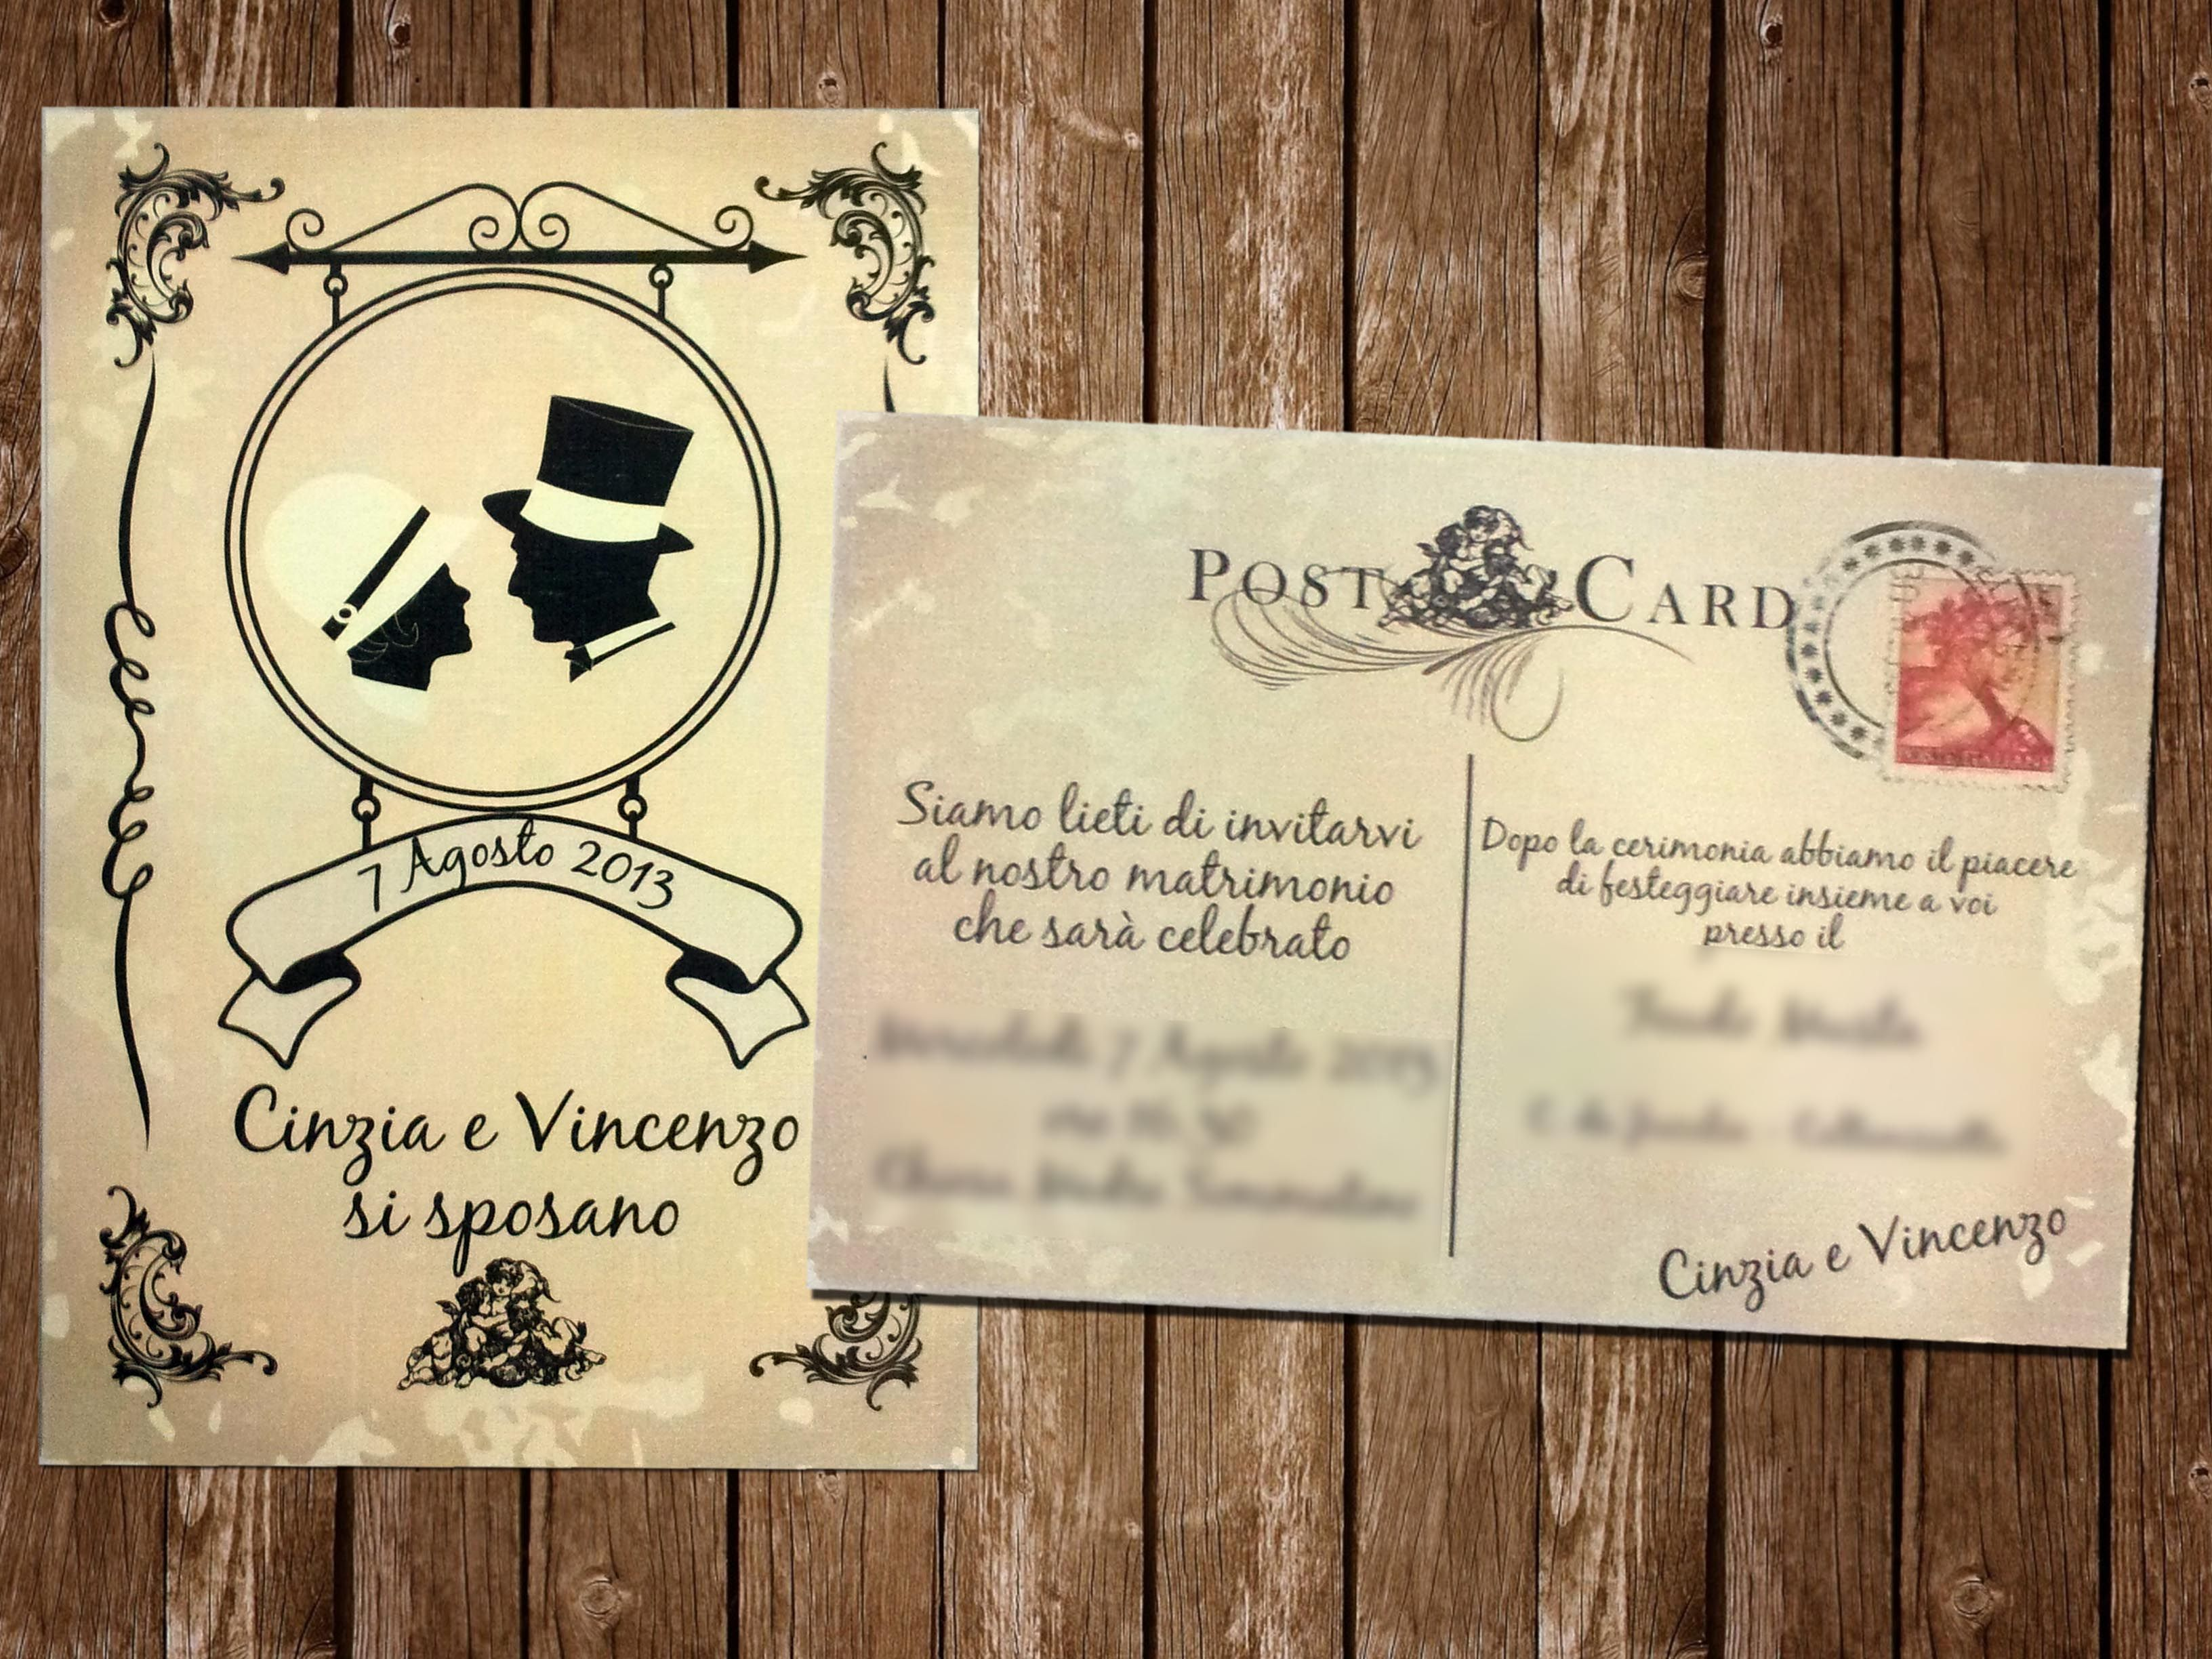 Partecipazioni Matrimonio Stile Vintage.Partecipazione Vintage Cartolina Partecipazioni Nozze Nozze